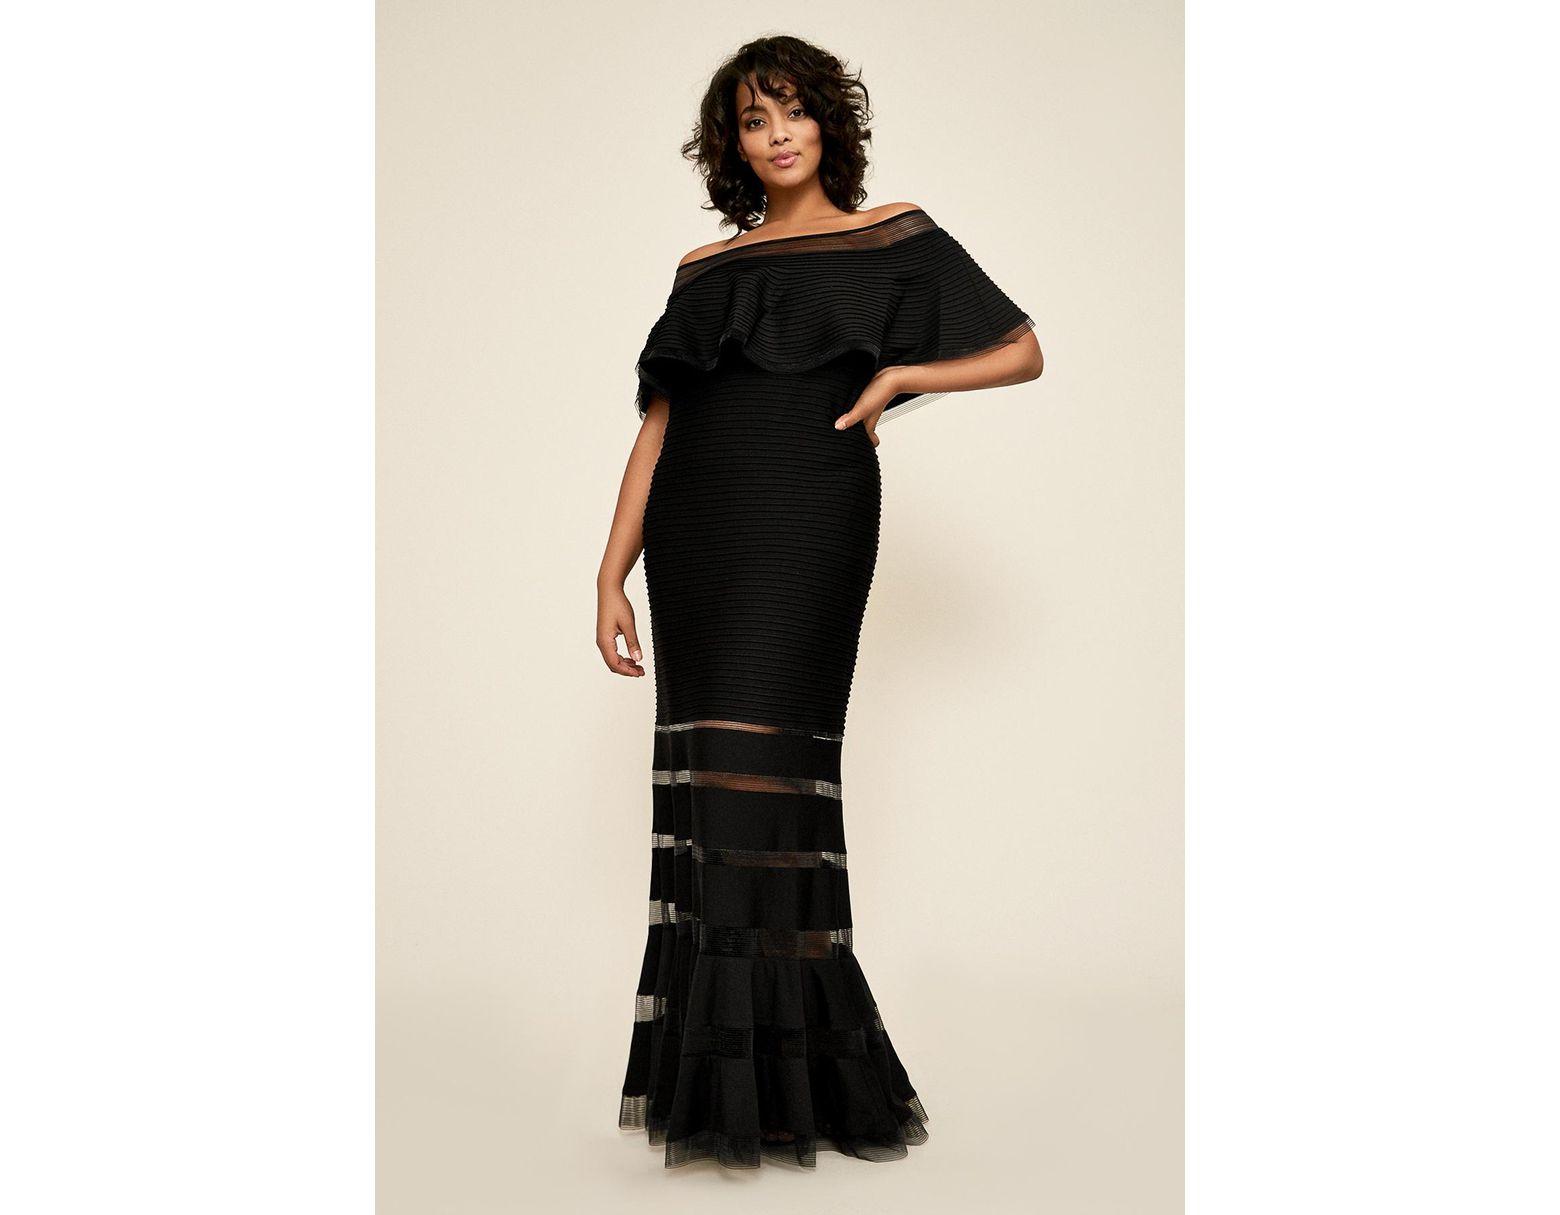 Tadashi Shoji Tabora Off-the-shoulder Gown - Plus Size in Black - Lyst